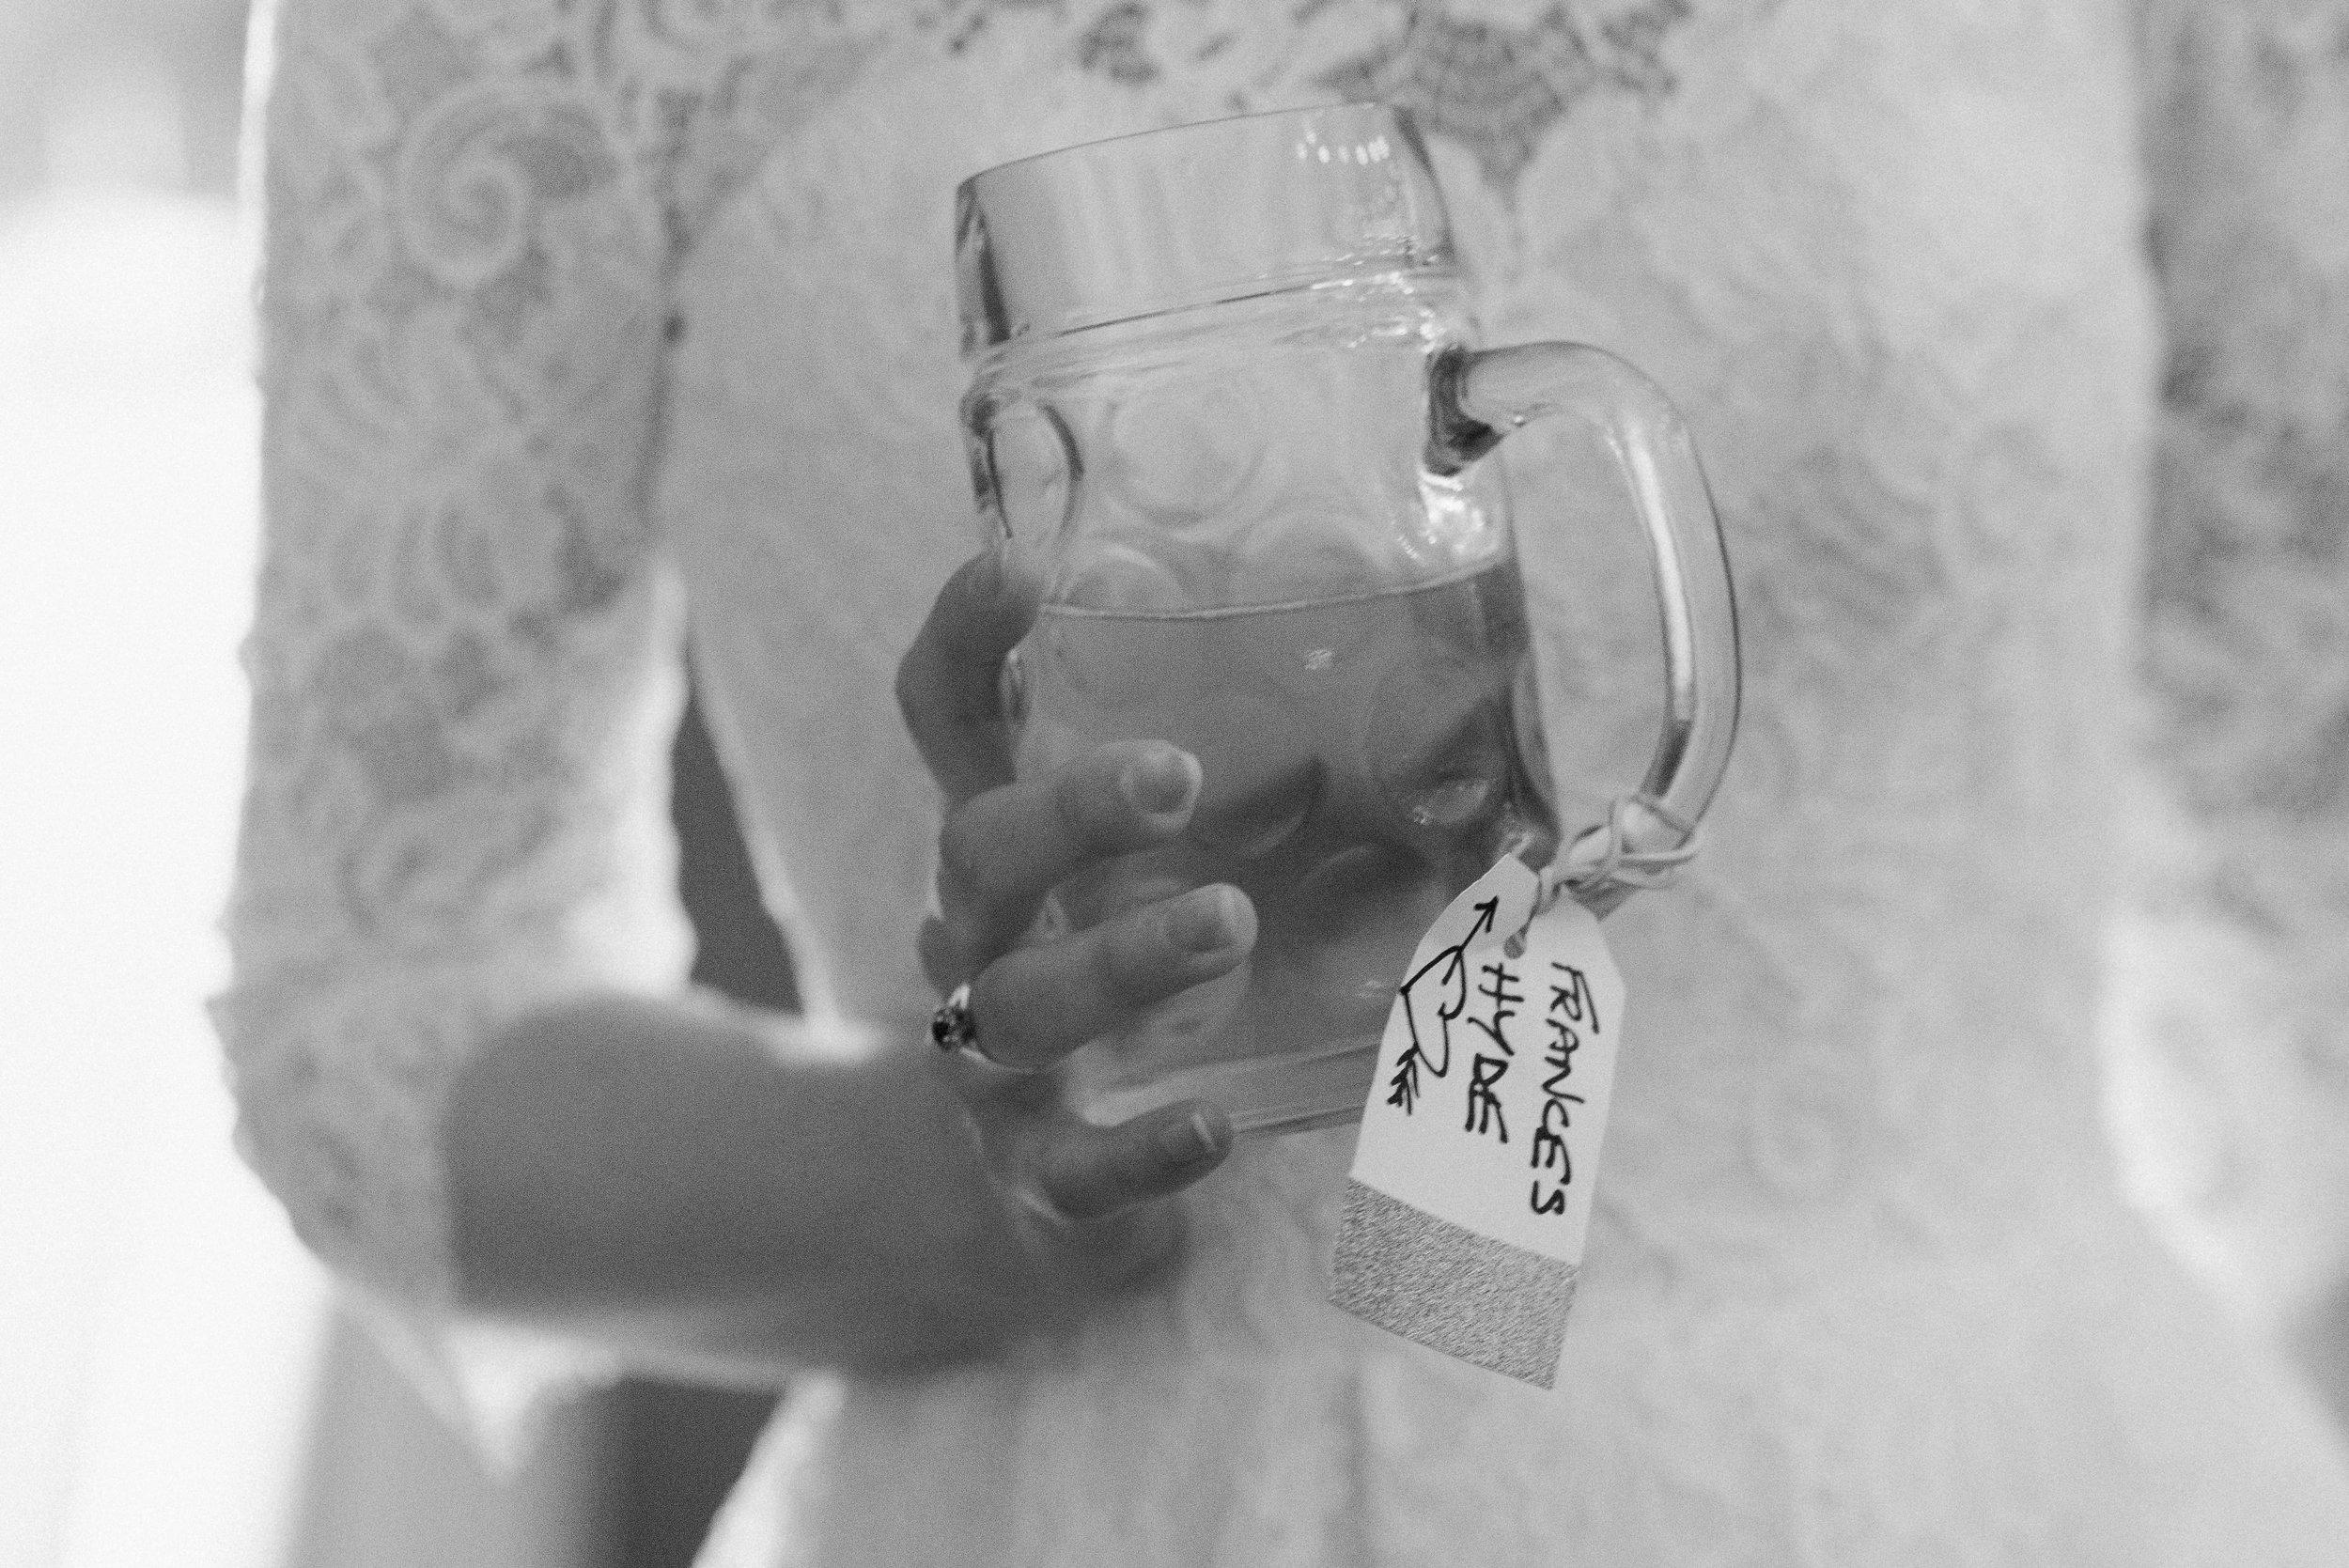 brisbane-gold-coast-sunshine-coast-tweed-romantic-fine-art-wedding-photography-lauren-olivia-58.jpg